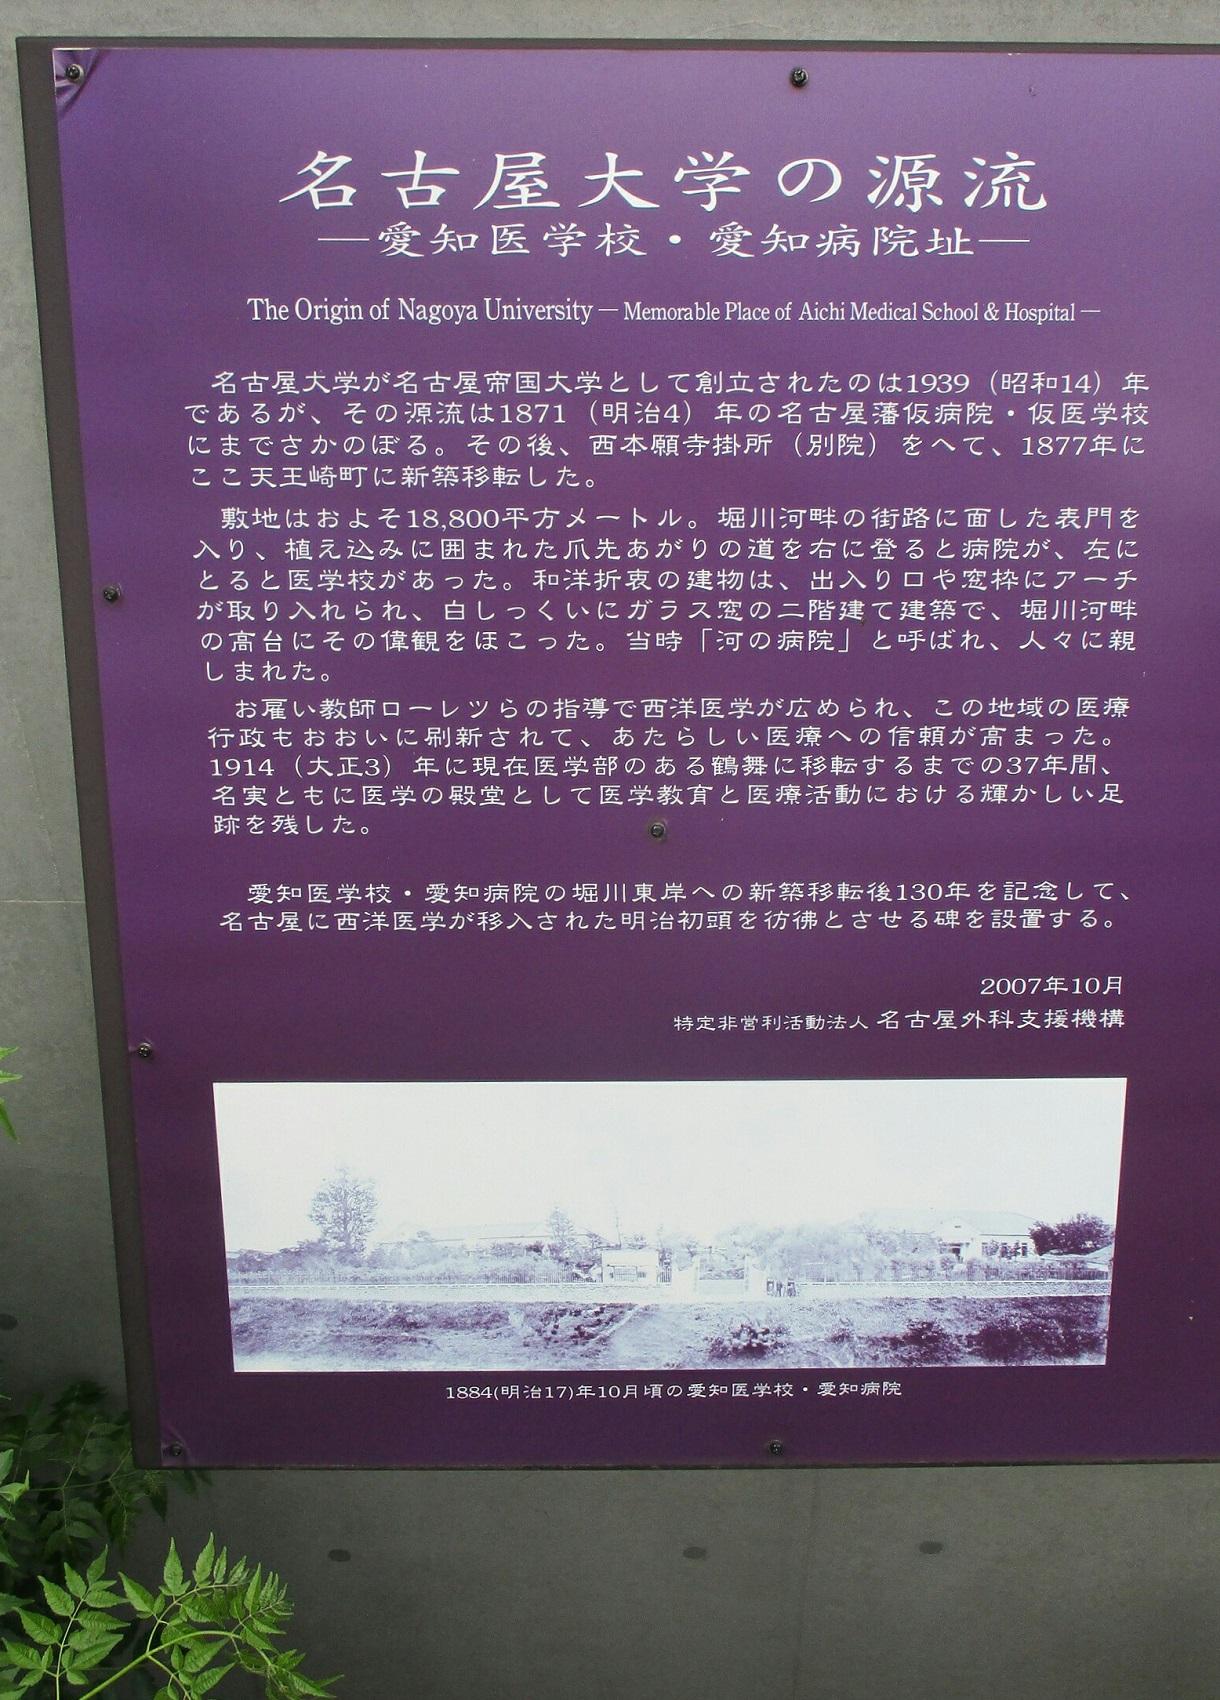 2019.6.11 (55) 堀川 - 「名古屋大学の源流」 1220-1700